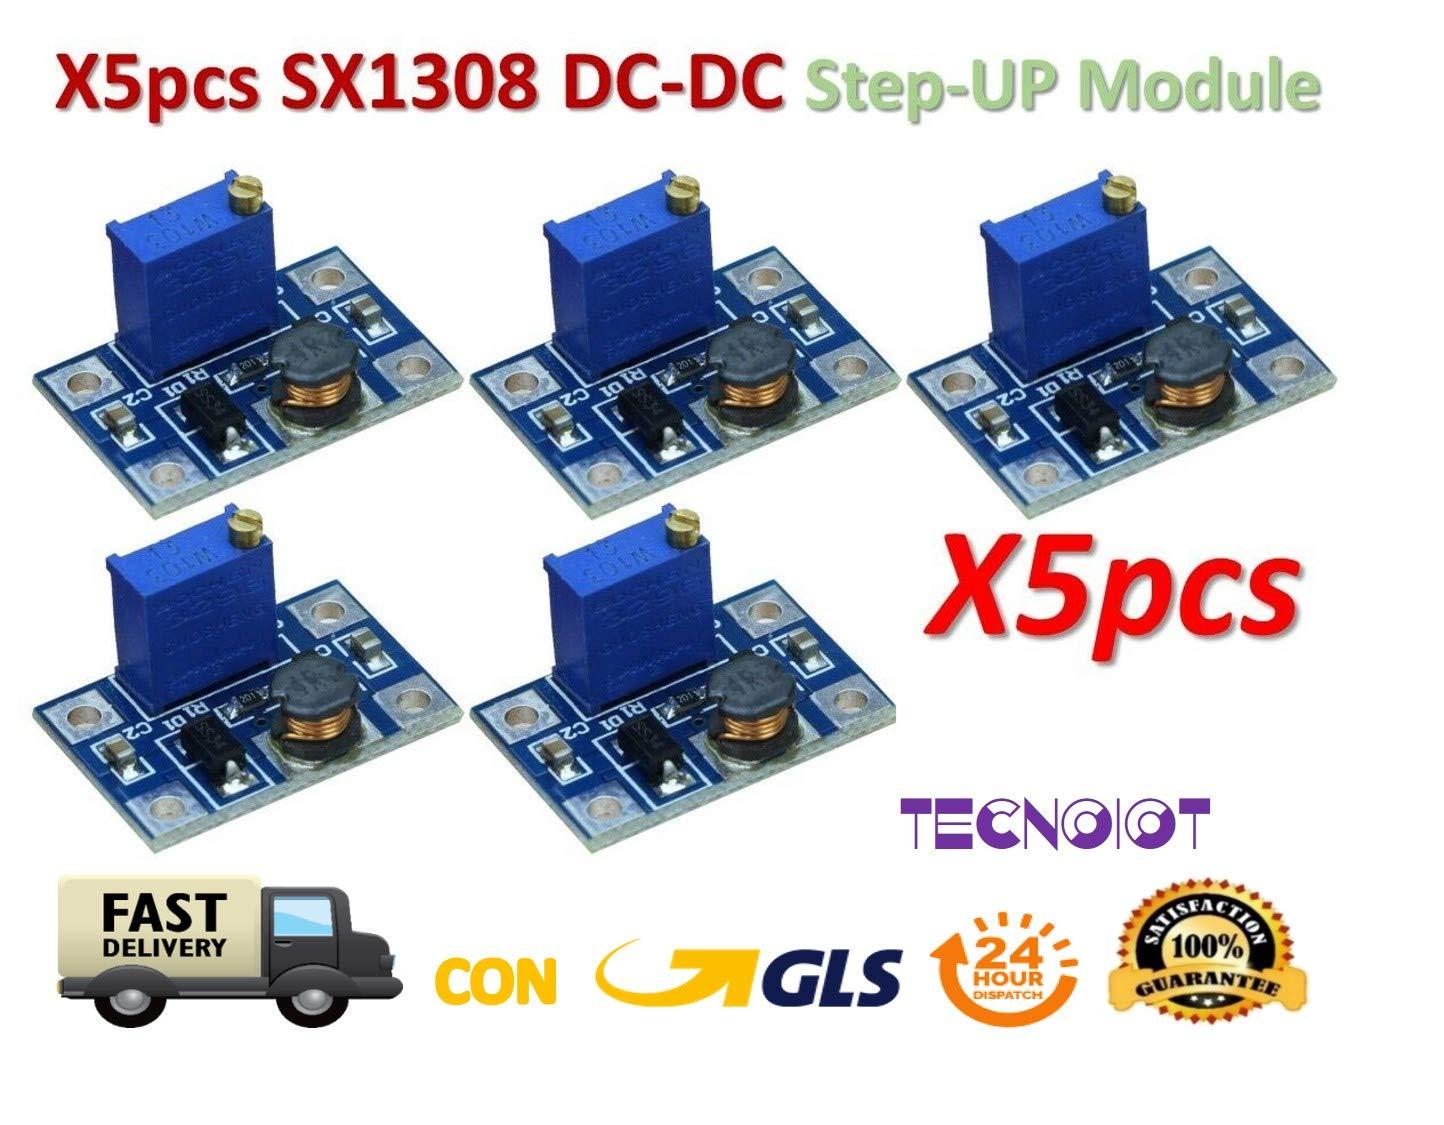 TECNOIOT 5pcs DC-DC SX1308 Step-UP Adjustable Step Up Boost Converter 2-24V to 2-28V 2A